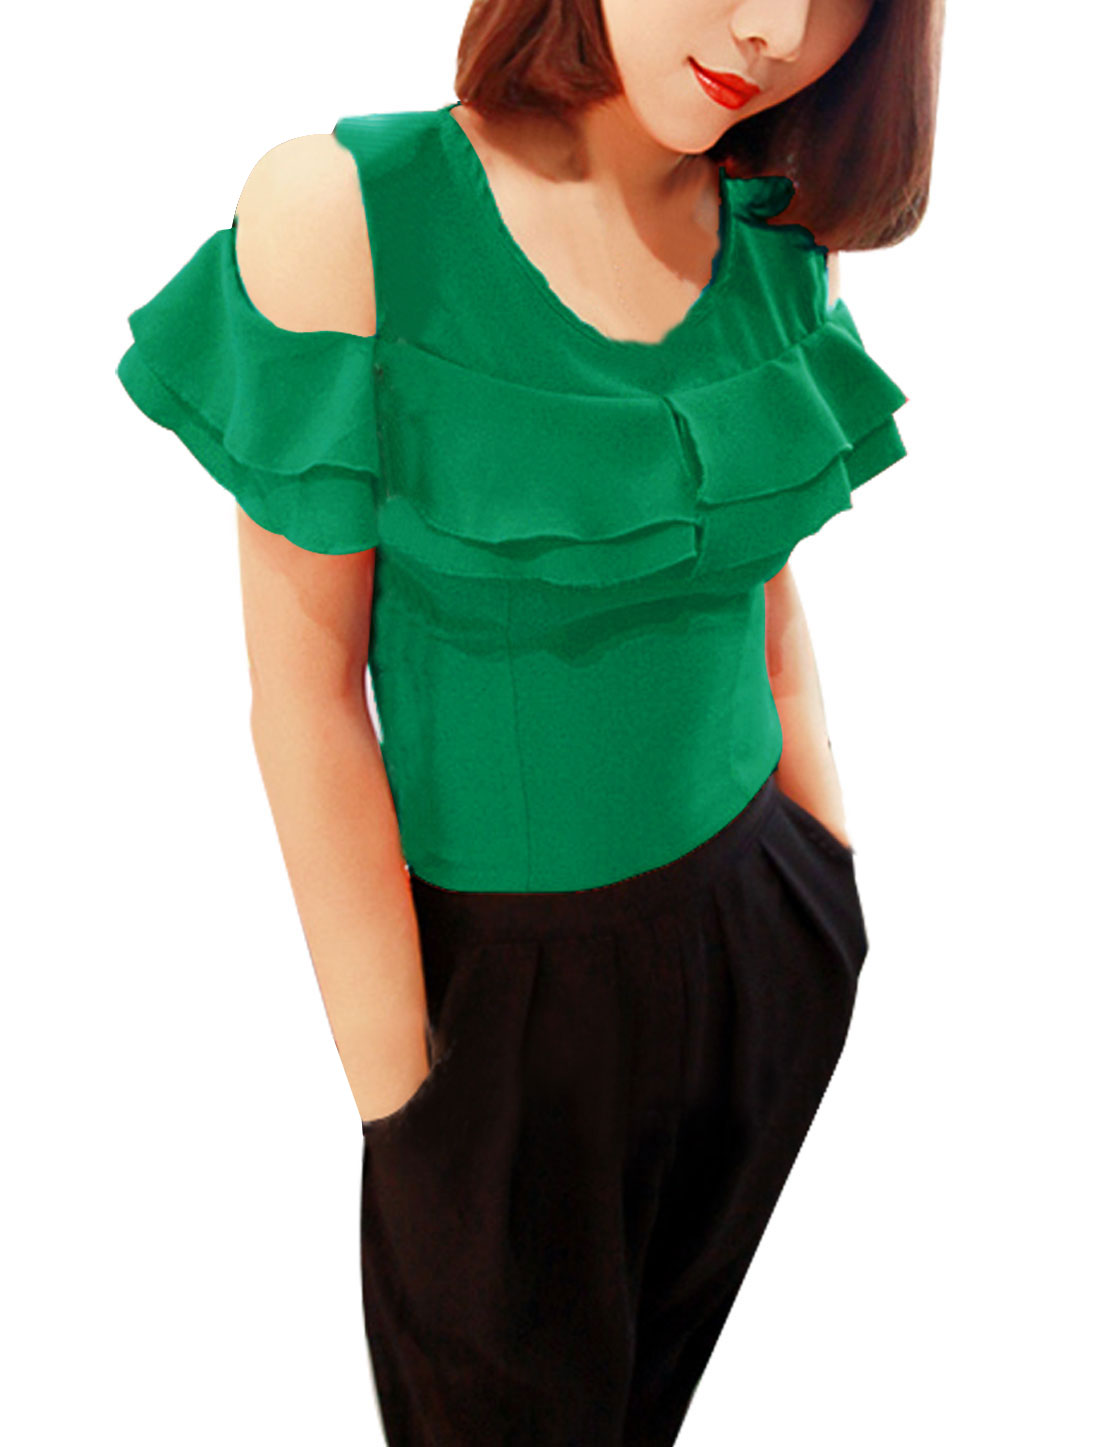 Lady Hidden Zipper Cape Detail Pullover Chic Top Blouse Green M